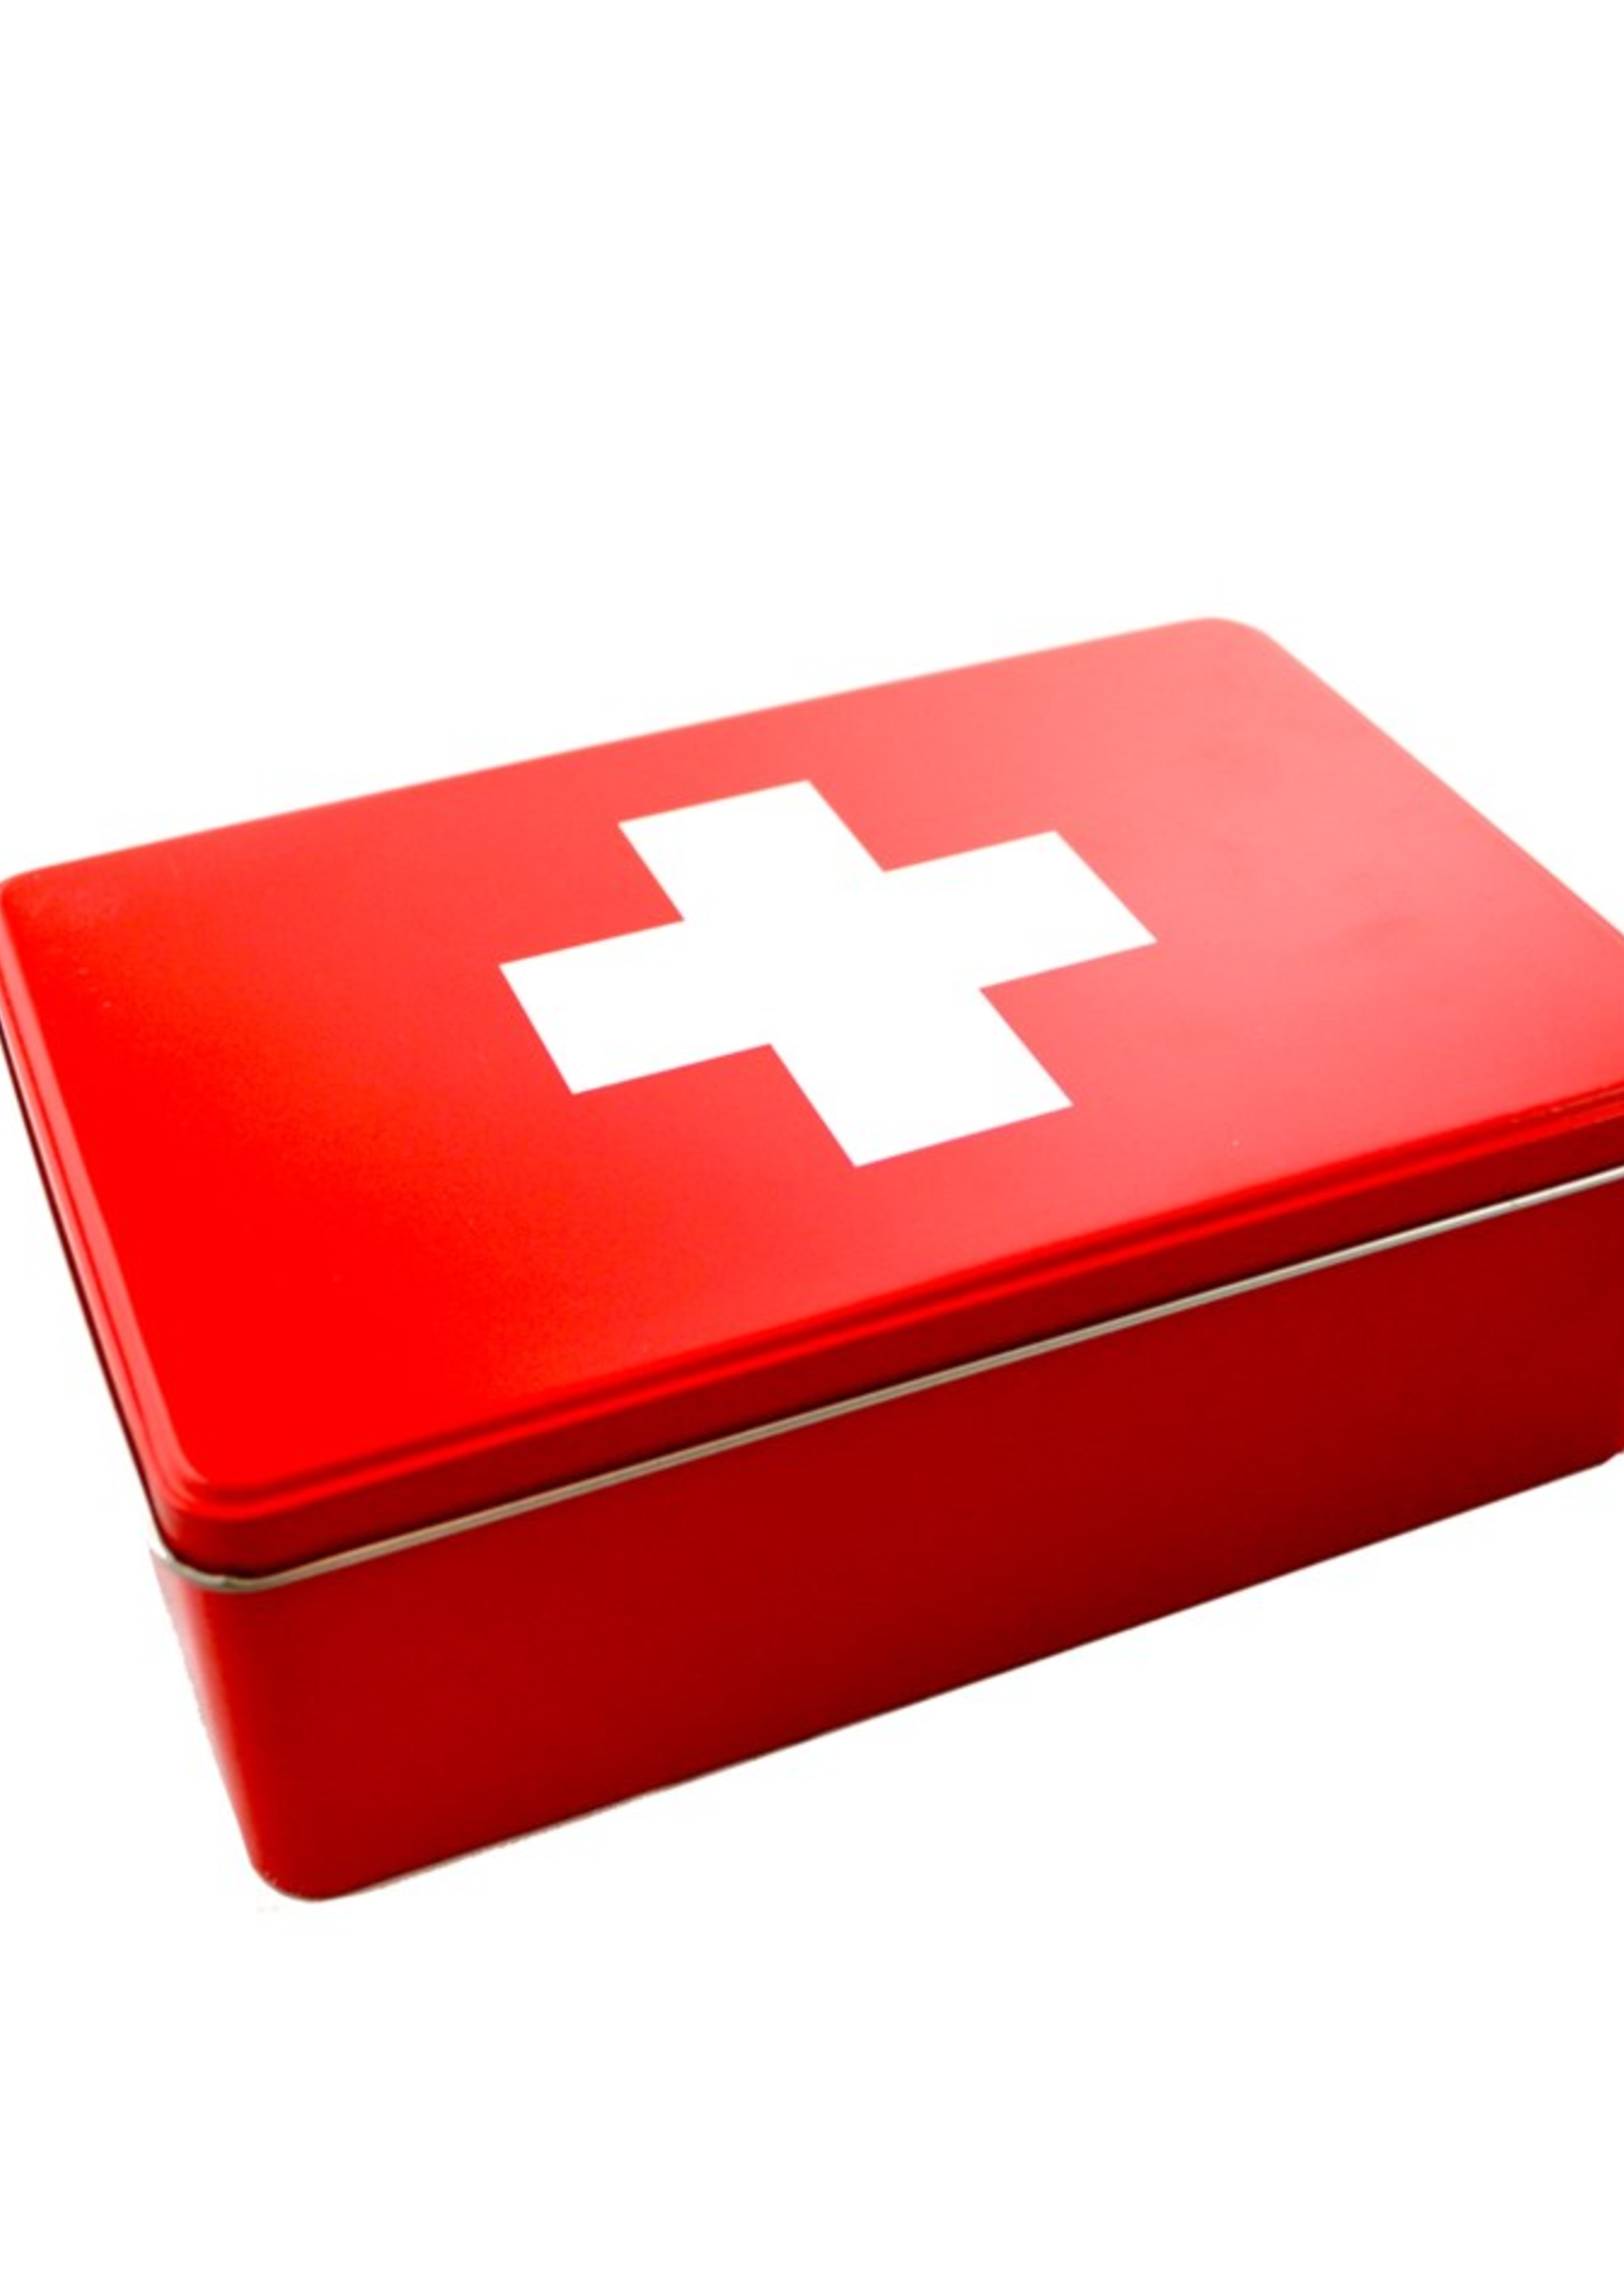 Tin Box Medical/ White